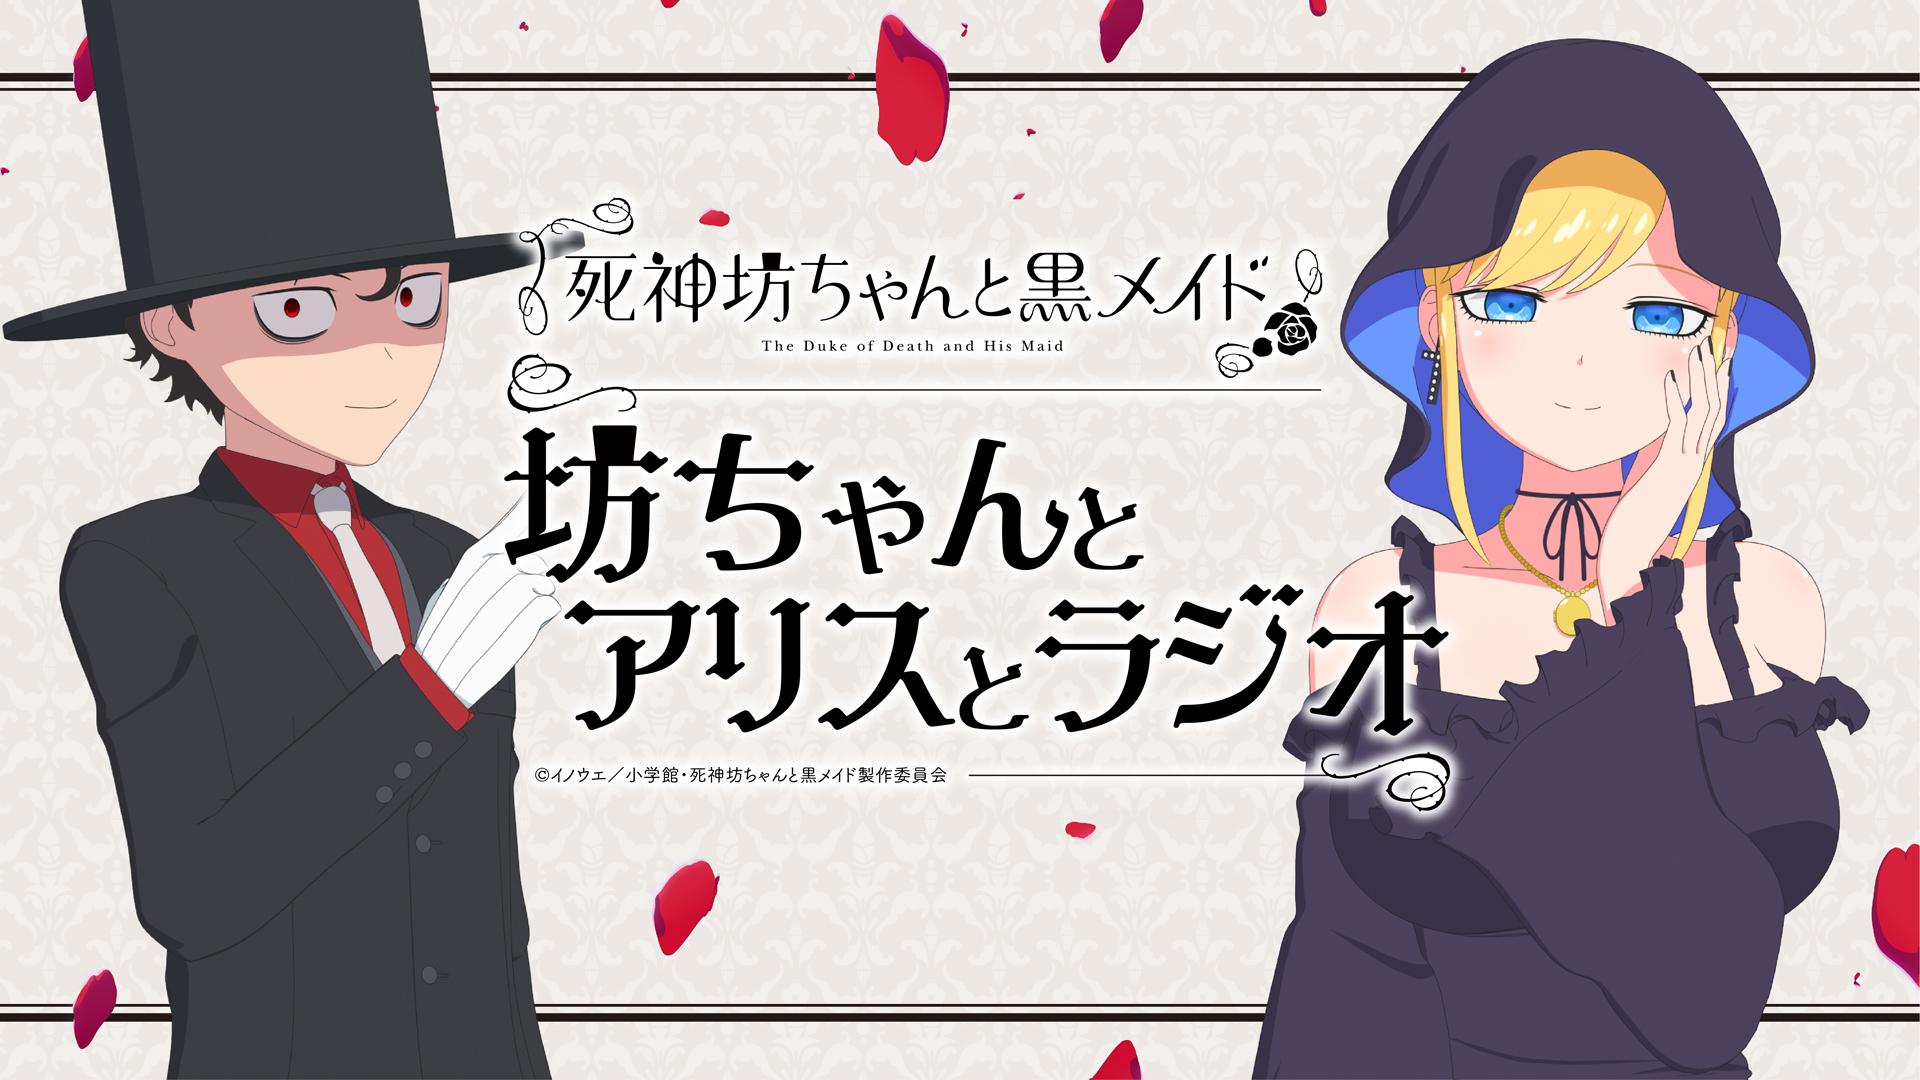 Shinigami Bocchan to Kuro Maid (The Duke Of Death And His Maid) Wallpaper  #3376762 - Zerochan Anime Image Board